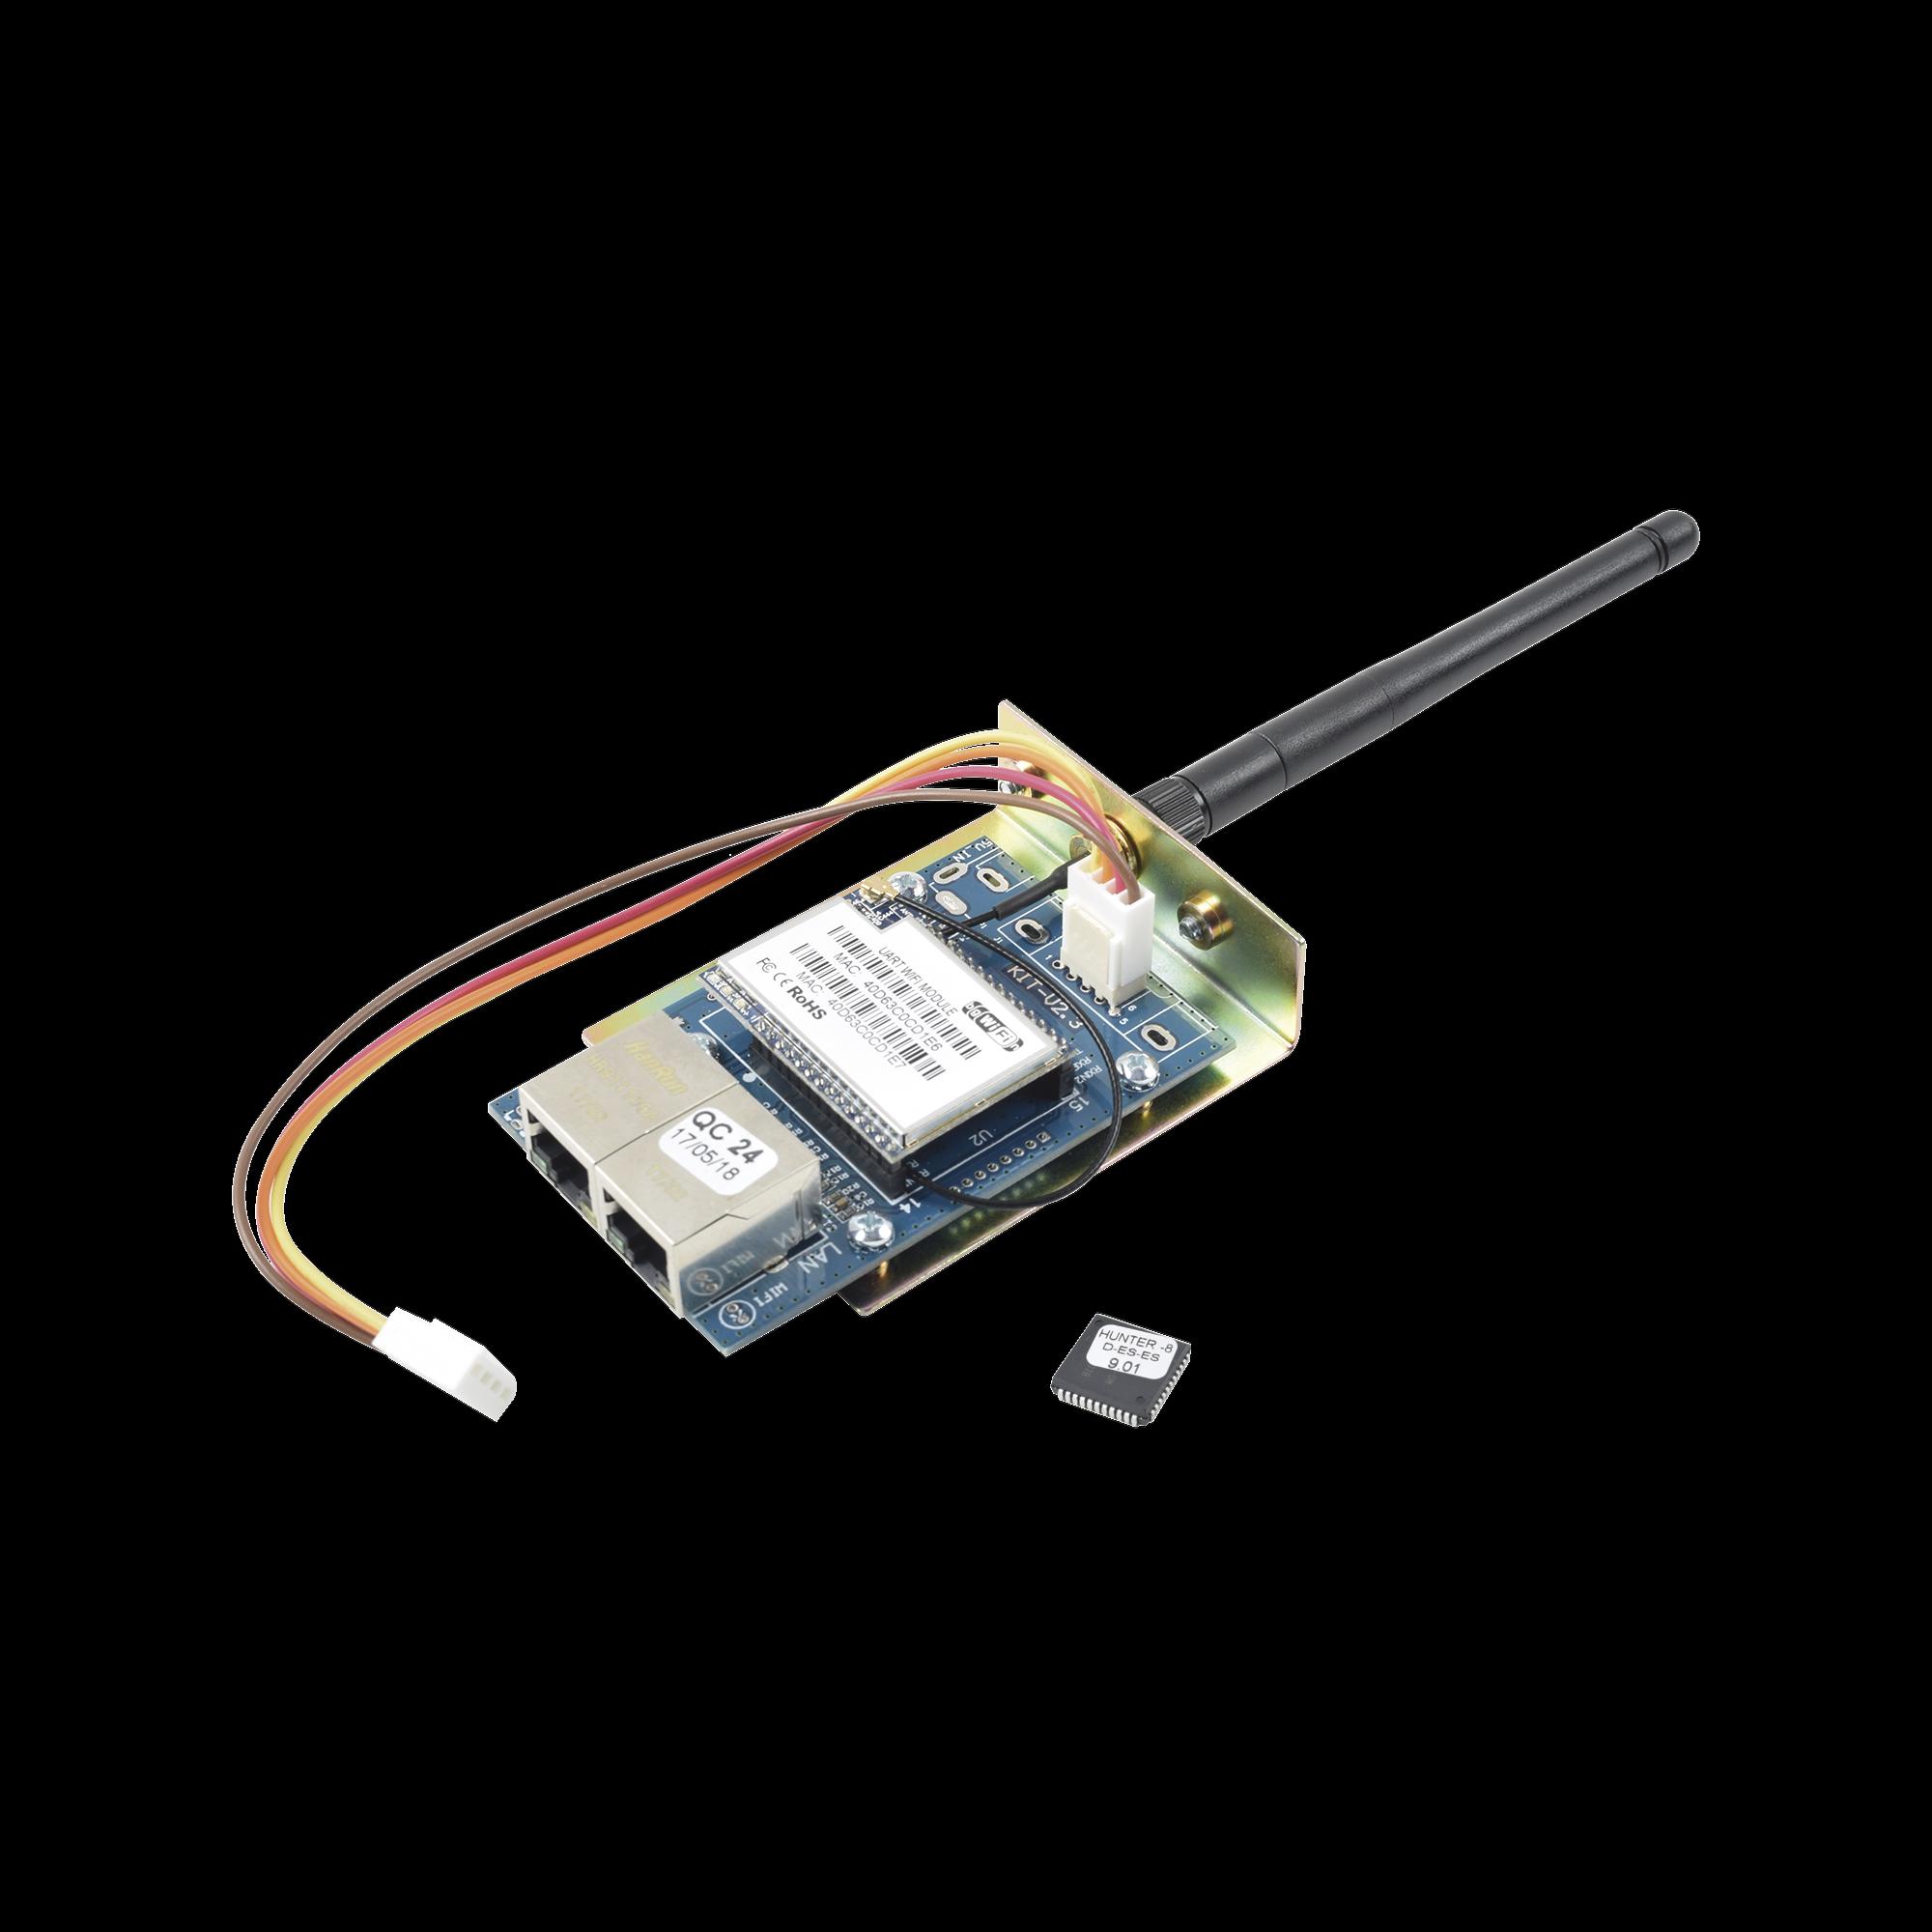 Kit de Comunicador WIFI/Ethernet para paneles PIMA HUNTER8 y CHIP para actualizar. Permite uso de App PIMALink 2.0 Gratuita.